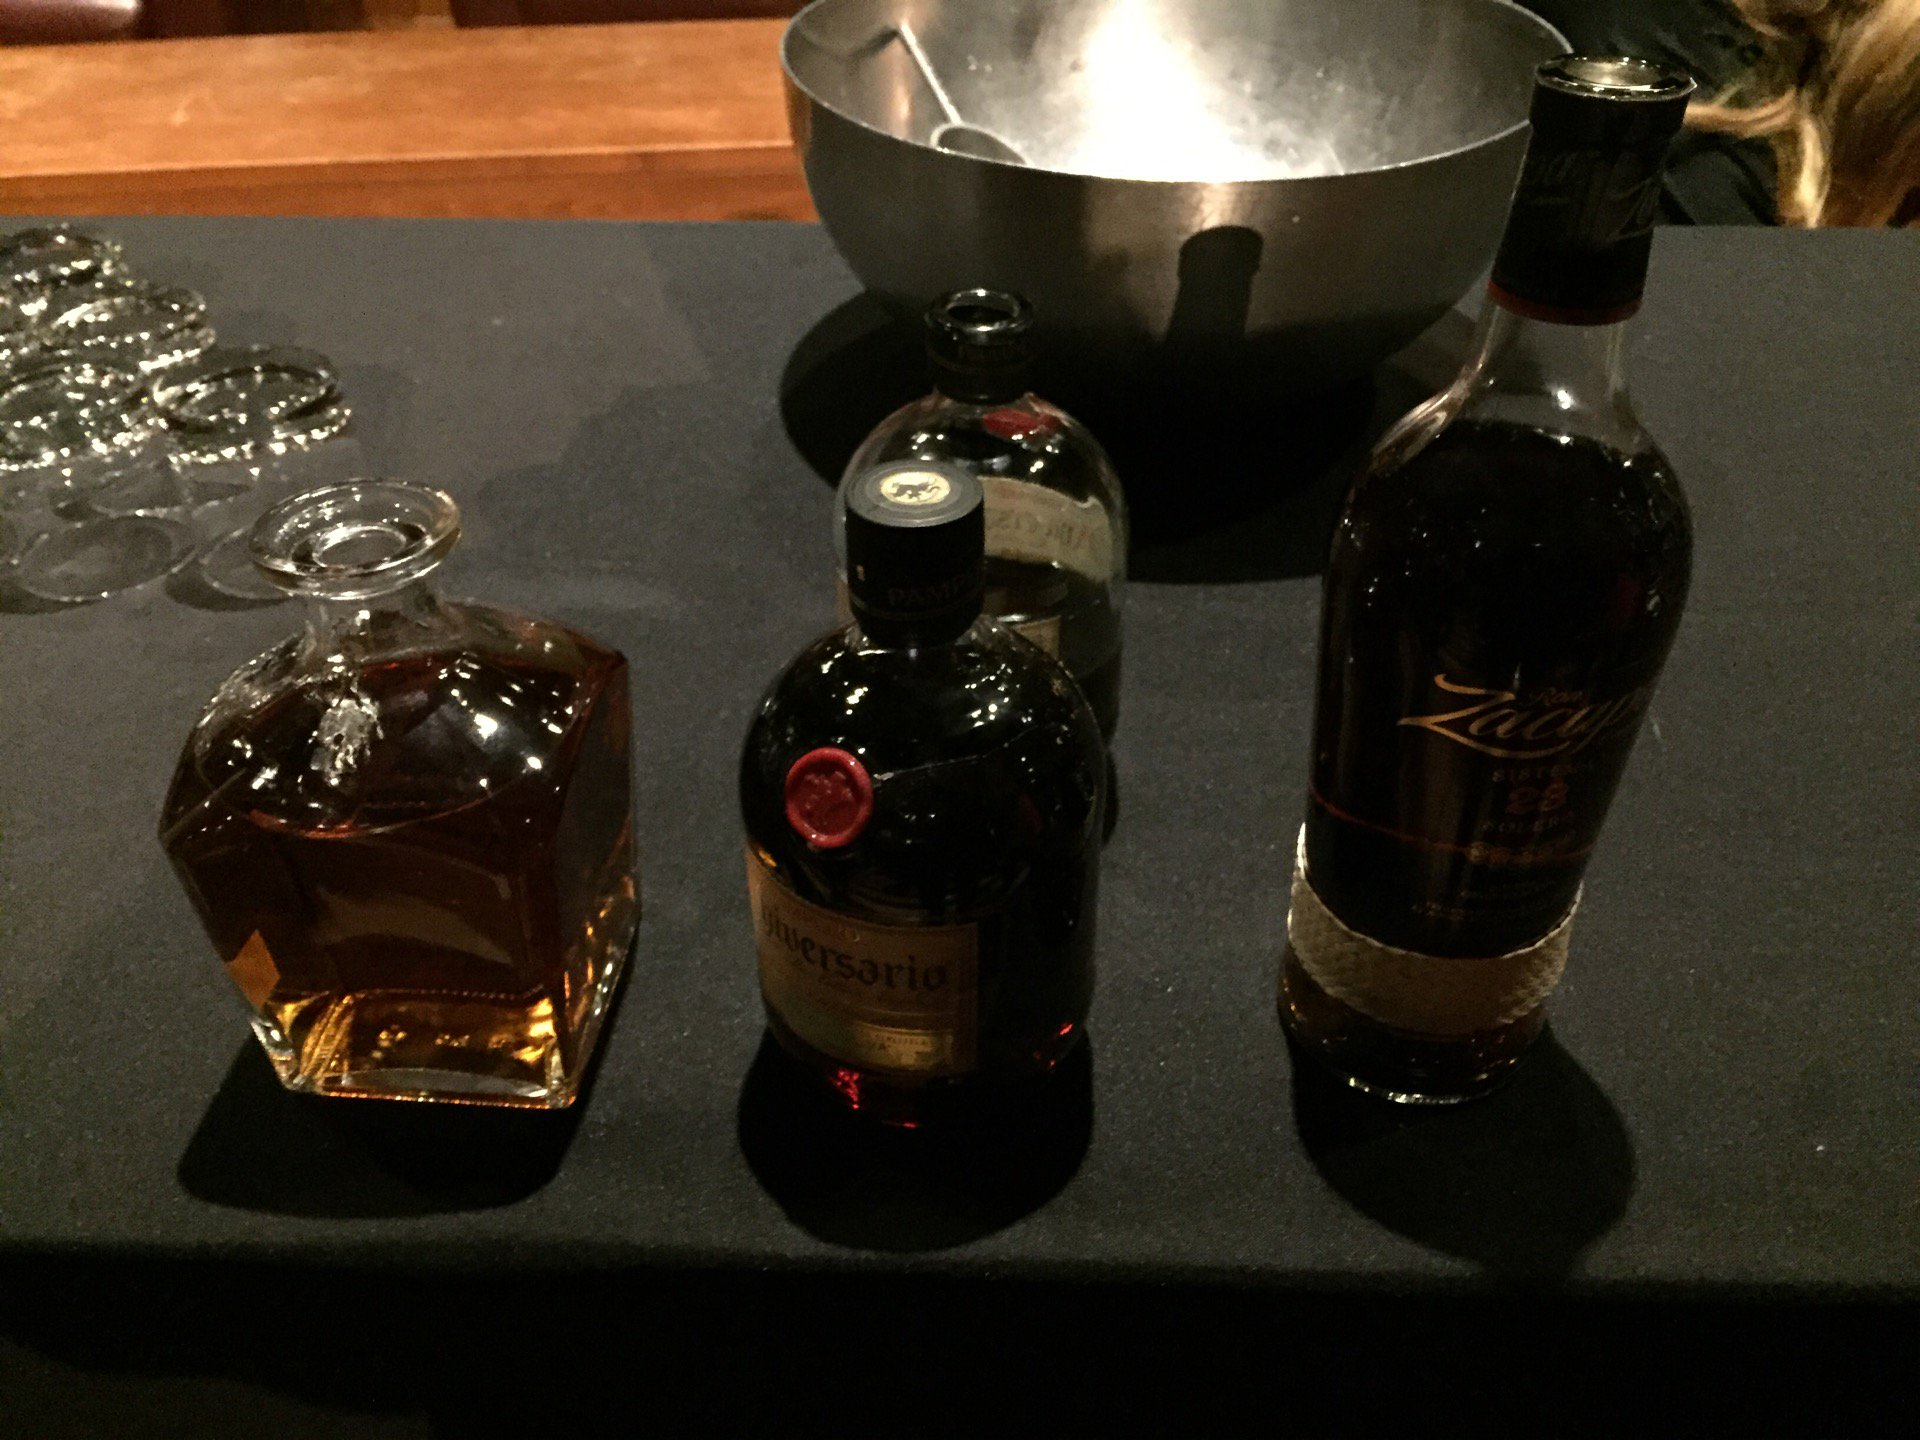 Rum Tasting! ¡Adelante Tigres! #AdelantePrinceton (@ Chancellor Green Hall in Princeton, NJ) https://t.co/LotqFDSVX7 https://t.co/Za4XpKXFPX